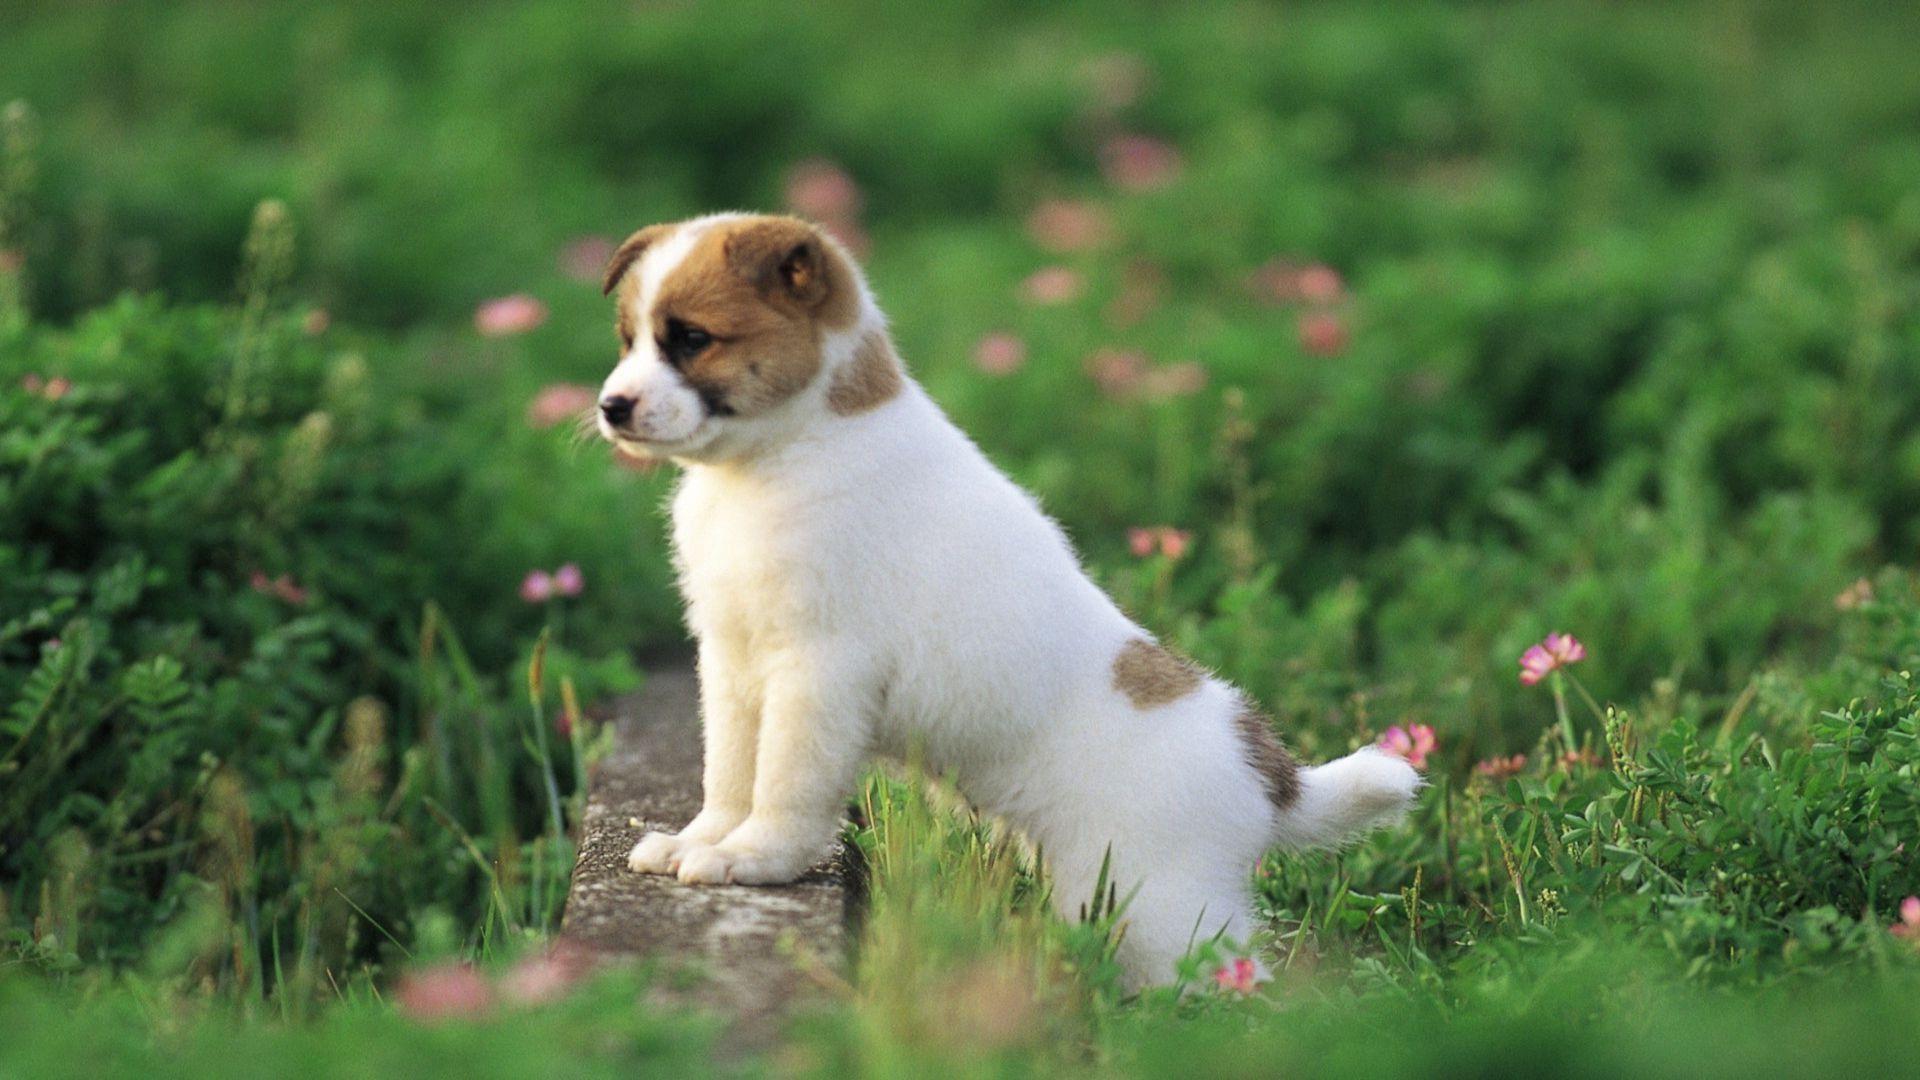 Wallpaper Hd Cute Puppies 2021 Live Wallpaper Hd Cute Puppy Wallpaper Pretty Dogs Baby Dogs